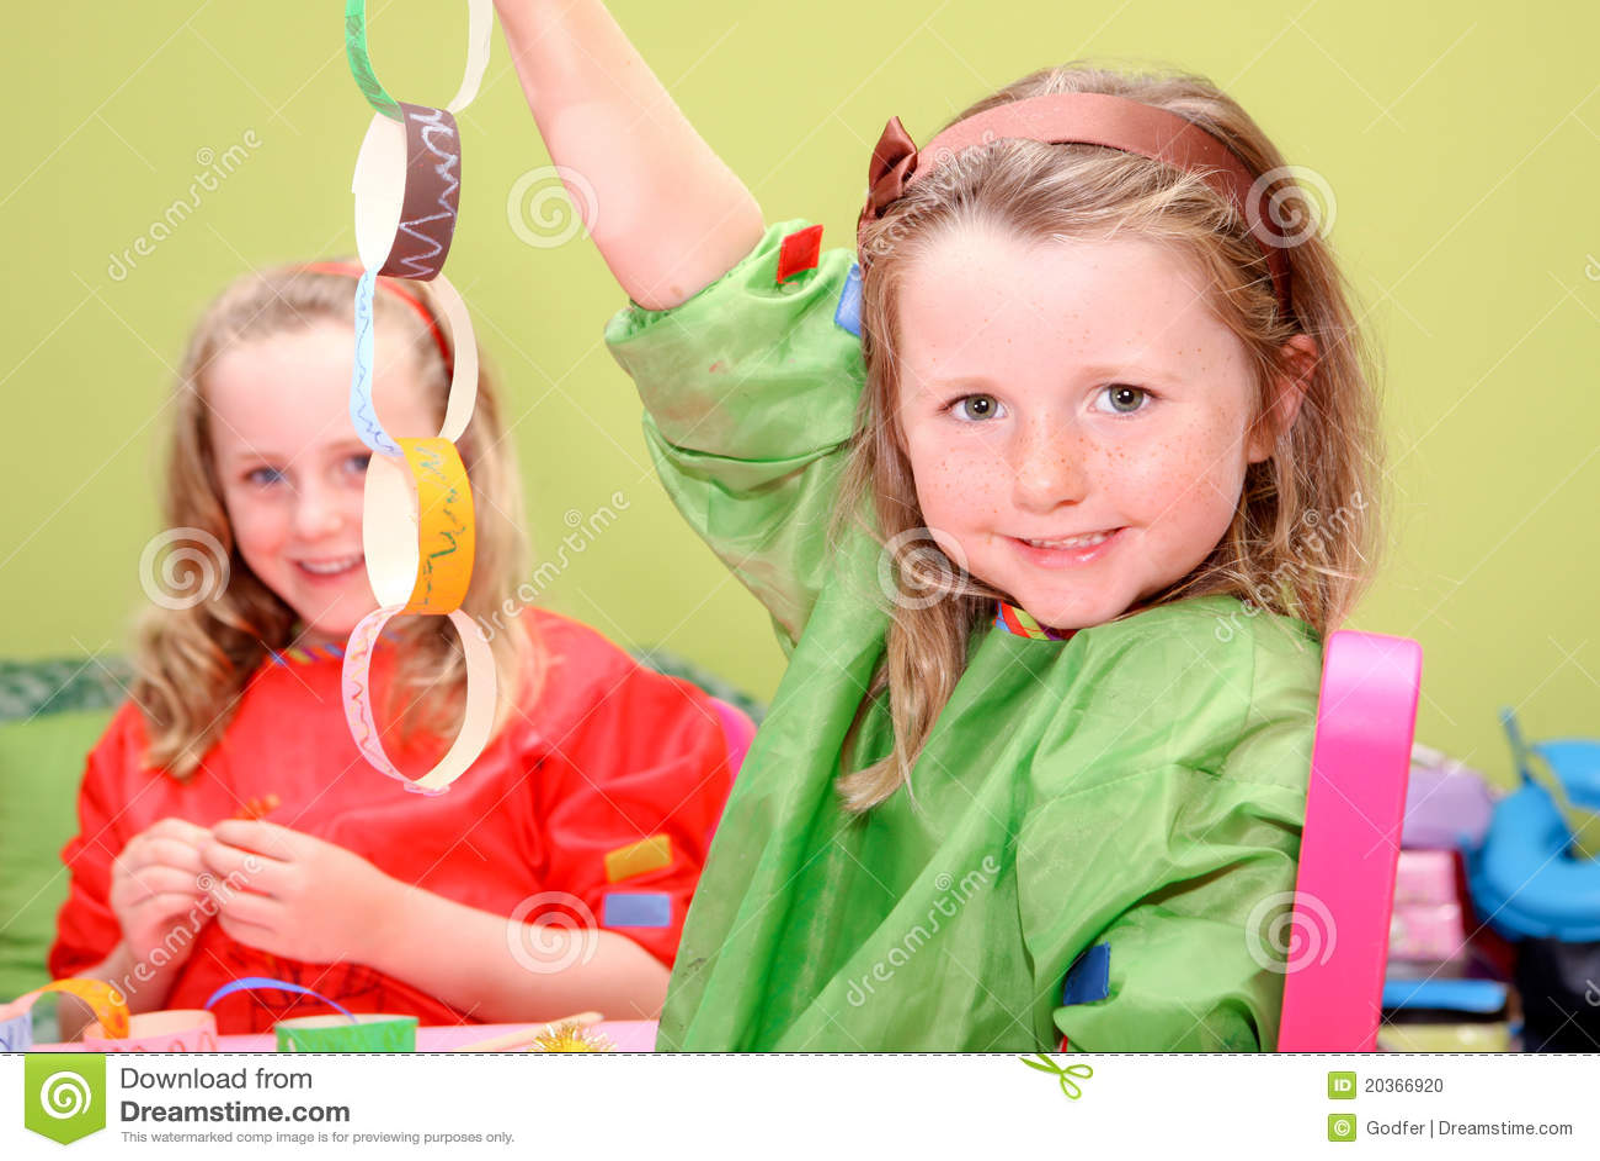 kids playing art and craft